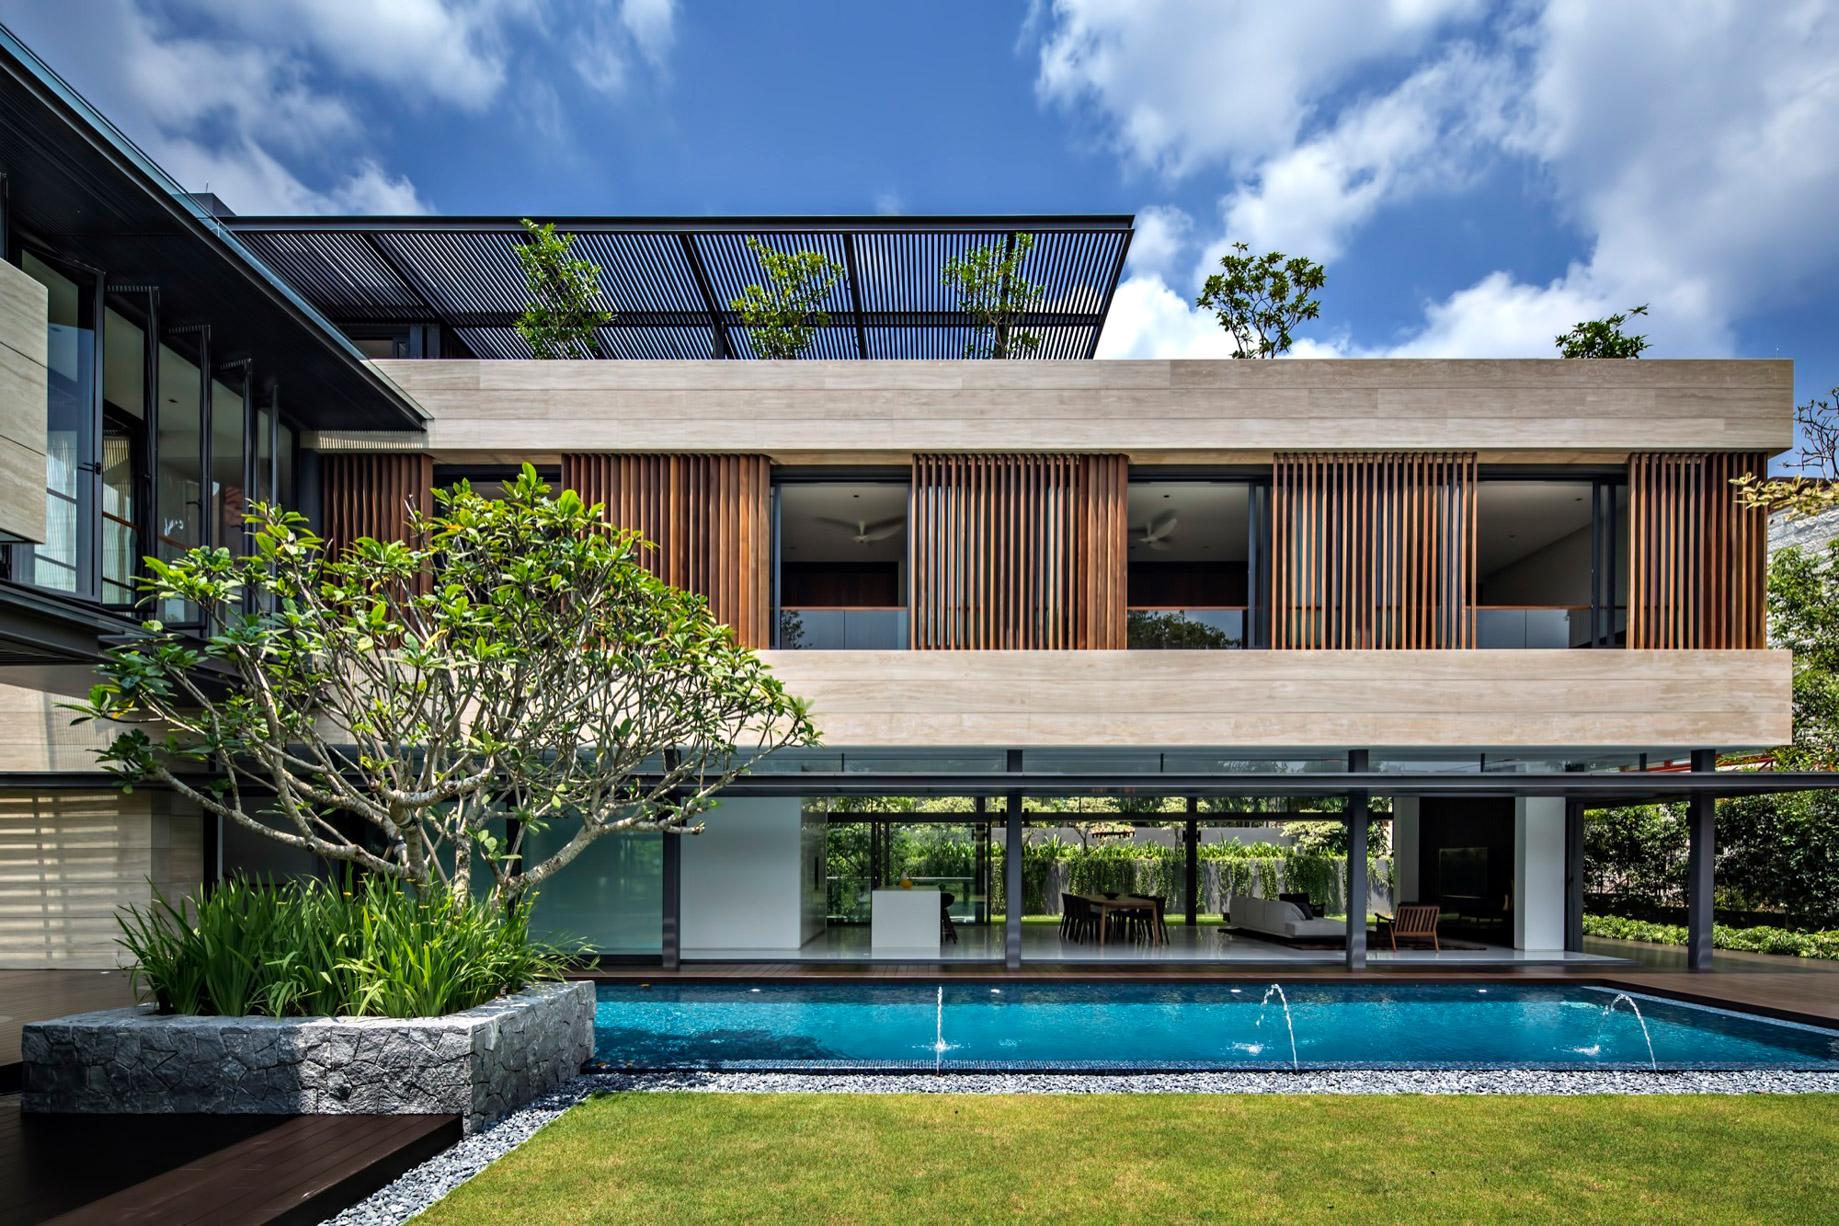 Secret Garden House Luxury Residence - Bukit Timah, Singapore